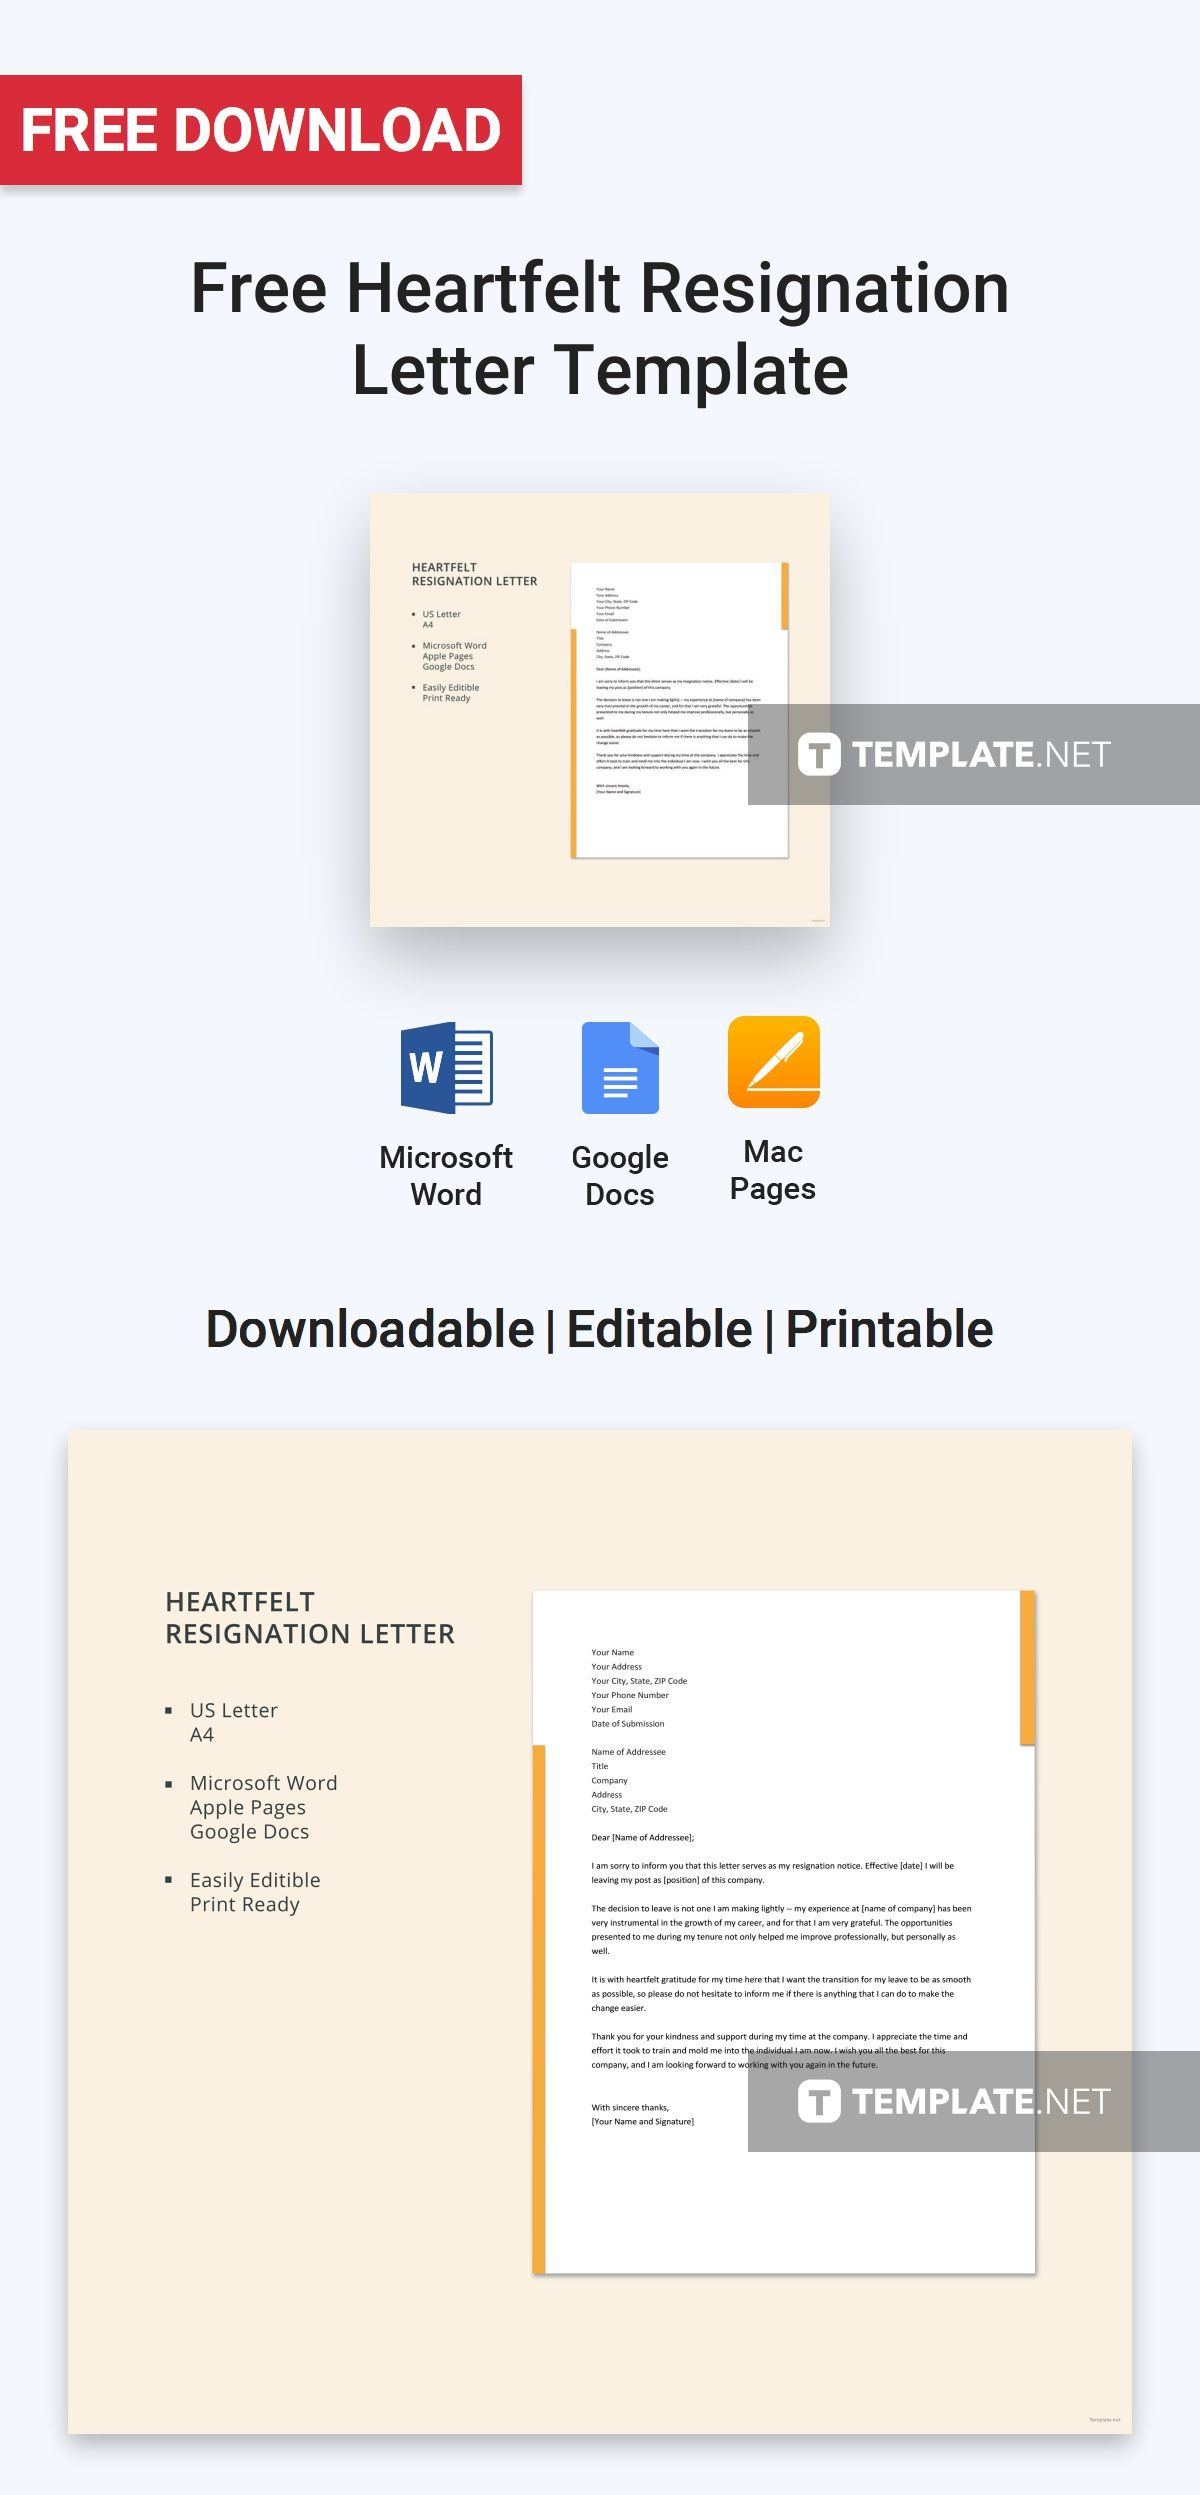 Free Heartfelt Resignation Letter Free Letter Templates - Google docs for personal use